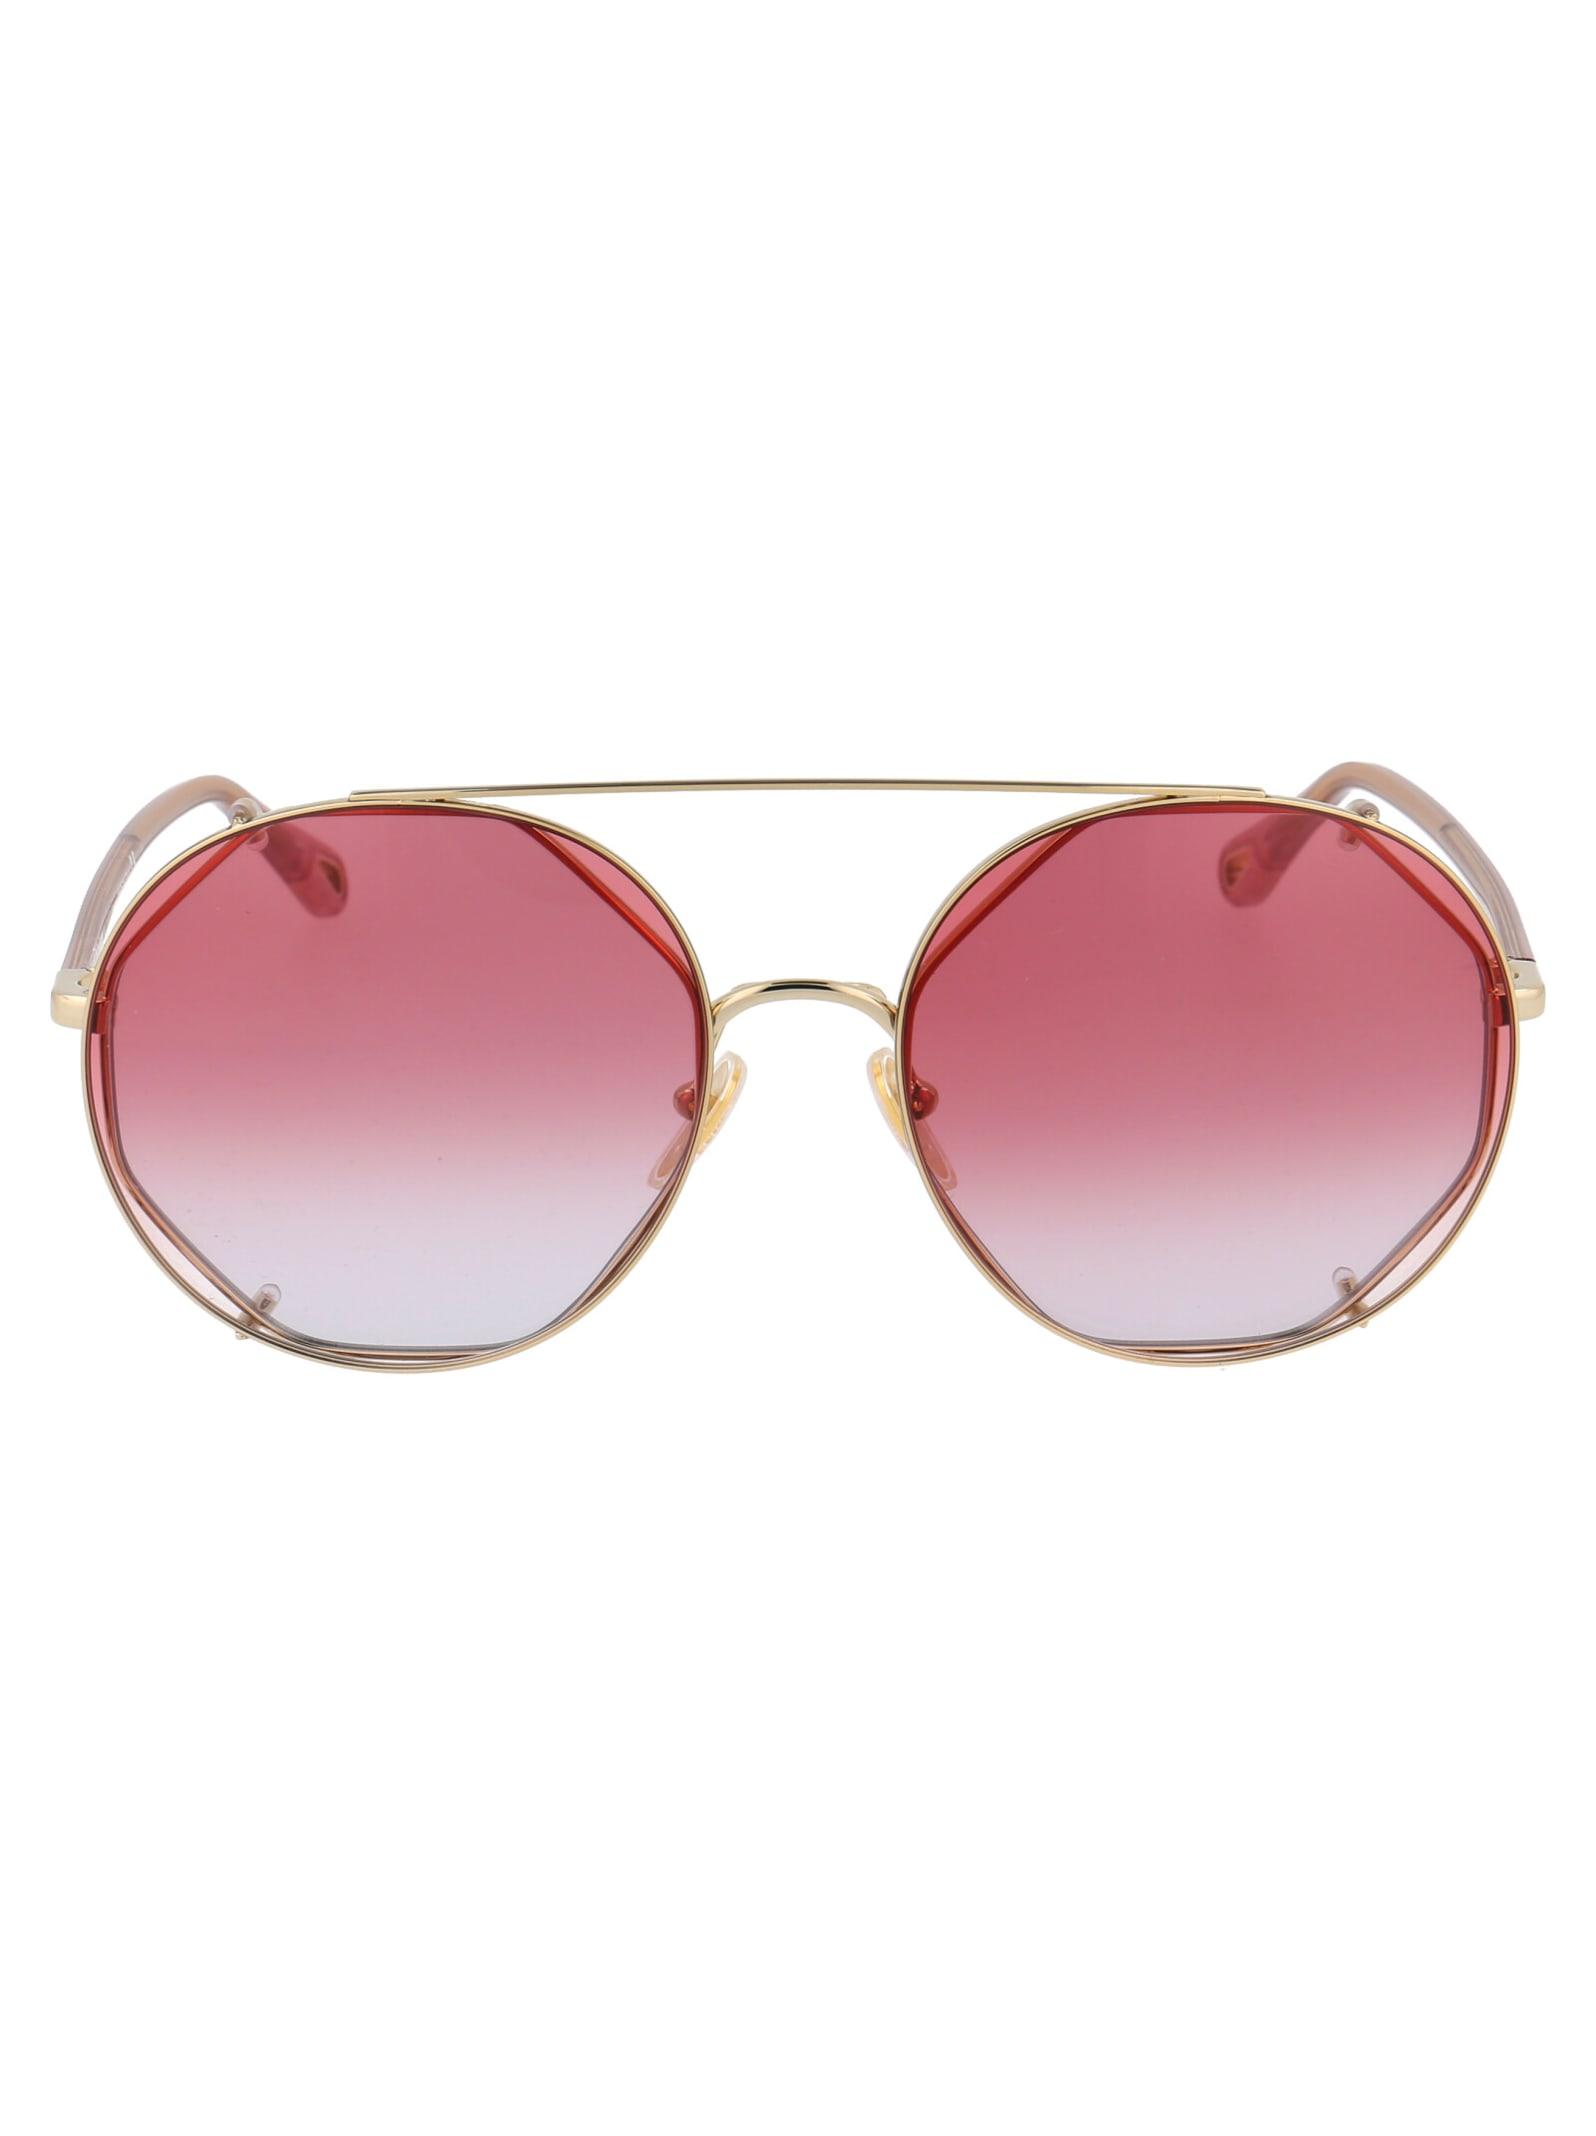 Chloé Ch0041s Sunglasses